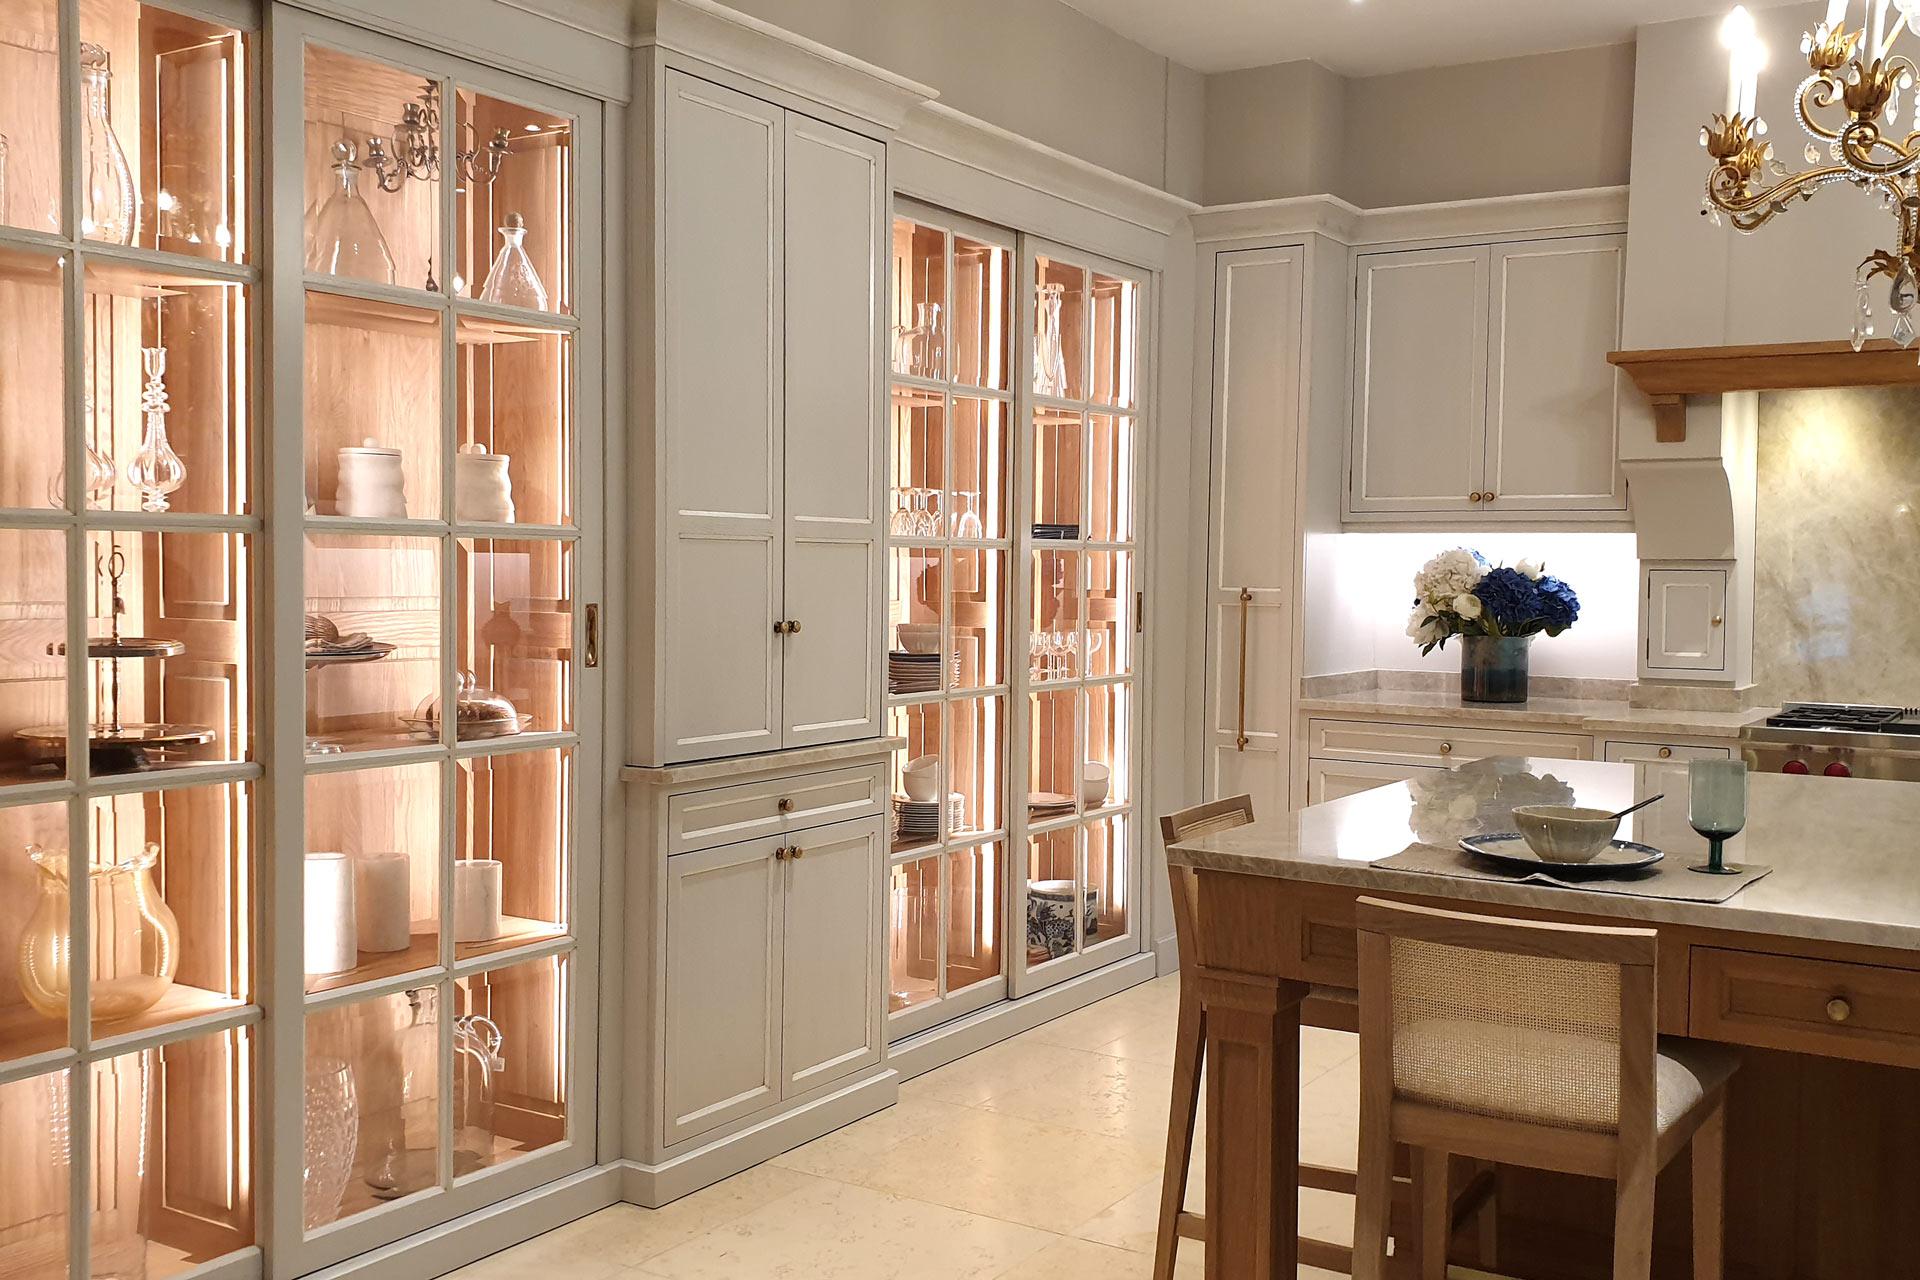 Kitchen, furniture and home decoration - DE TONGE